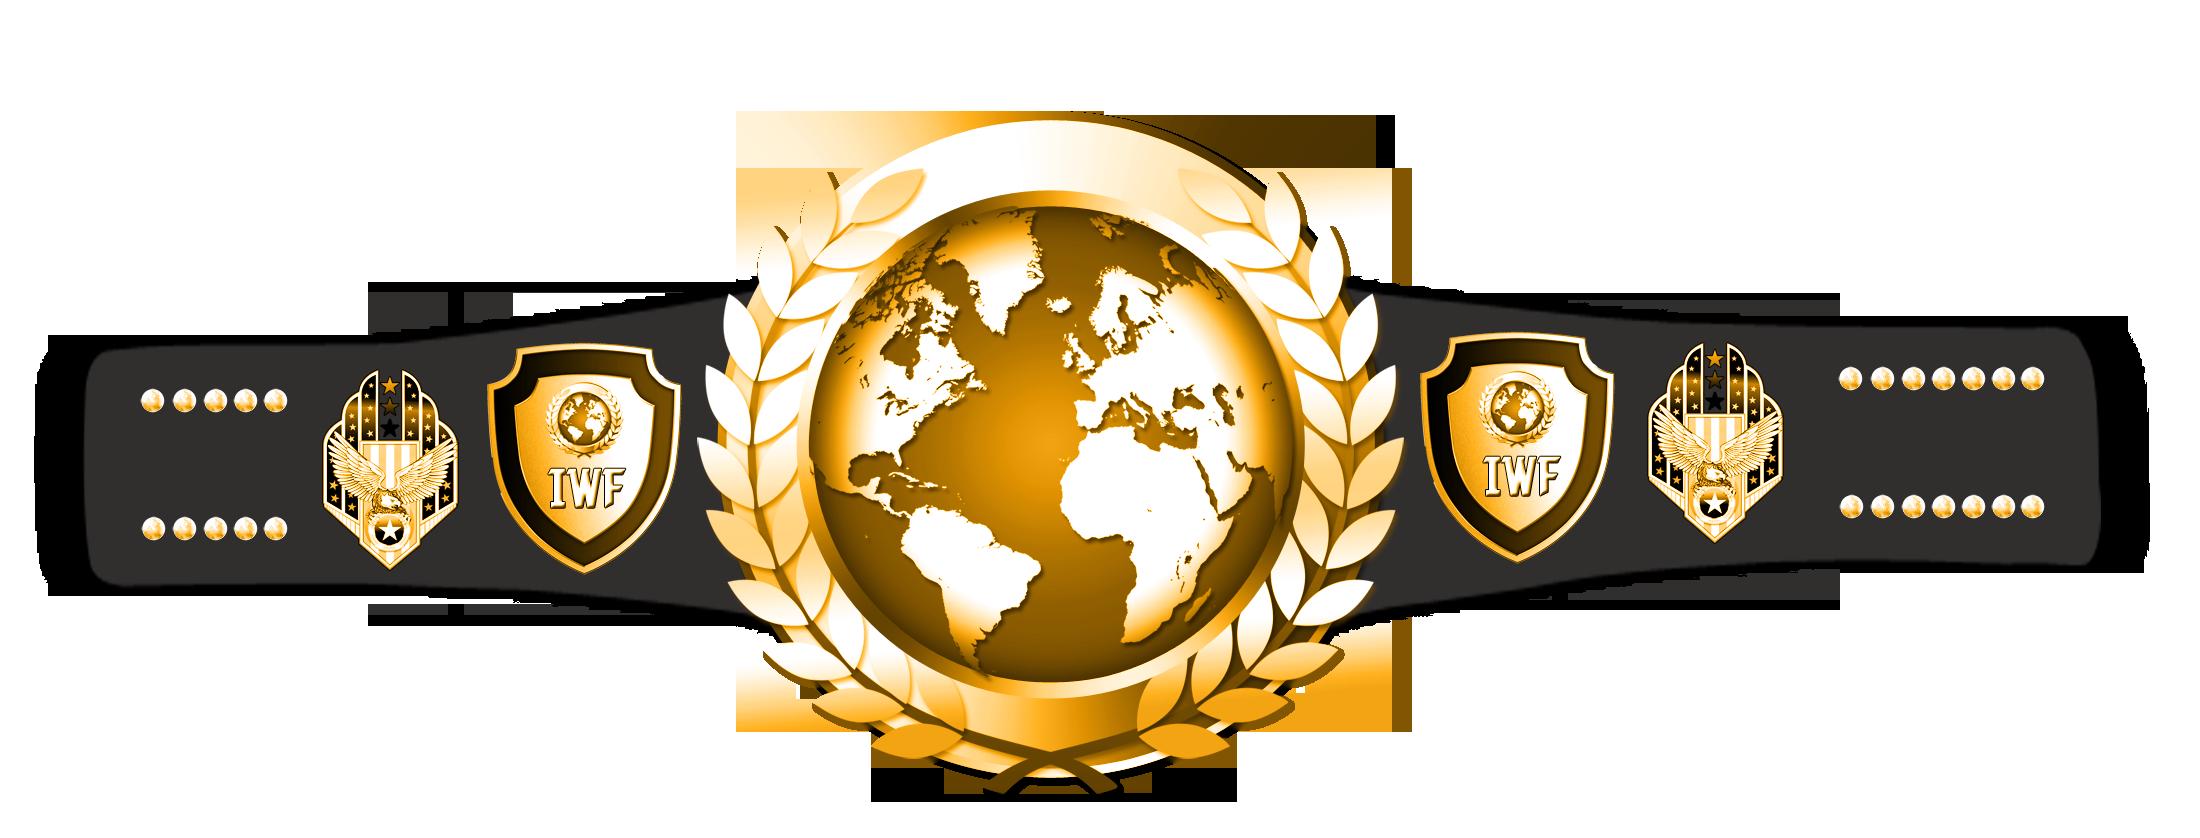 Infinity the ewrestling encyclopedia. Wrestlers clipart wrestling champion